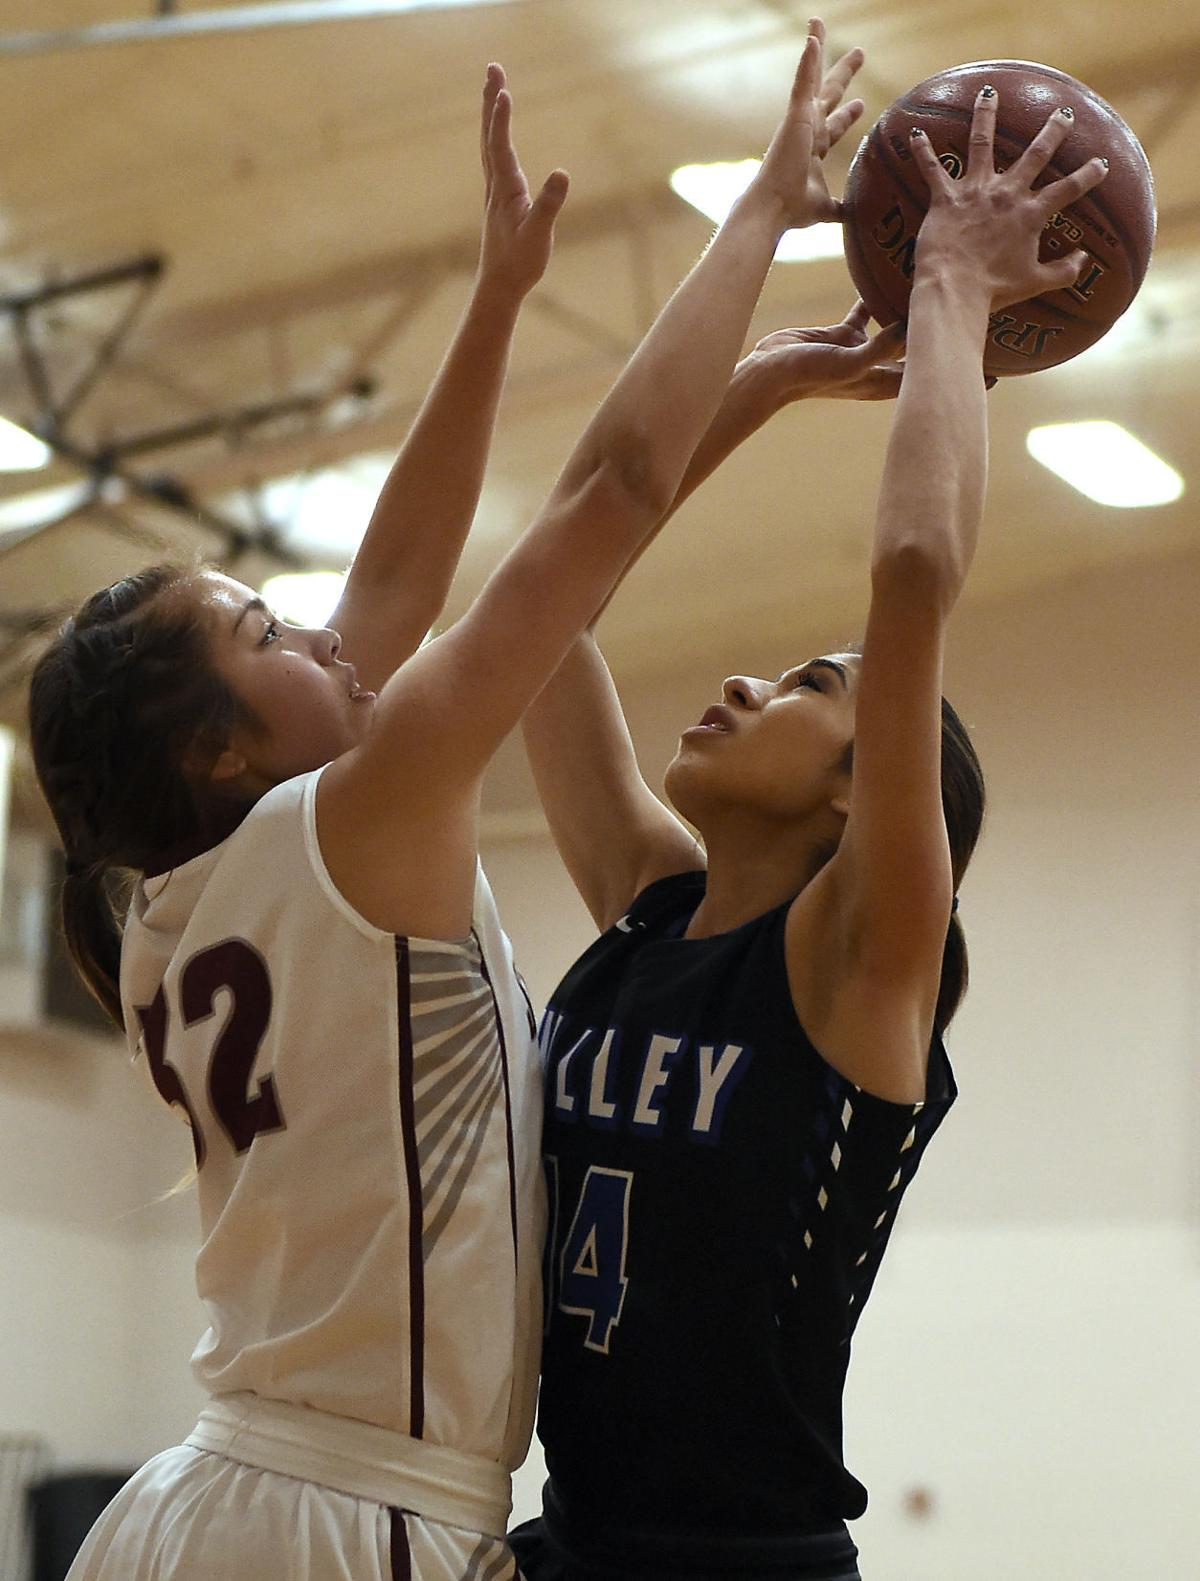 Girls Basketball - Valley Vs. Shoshone